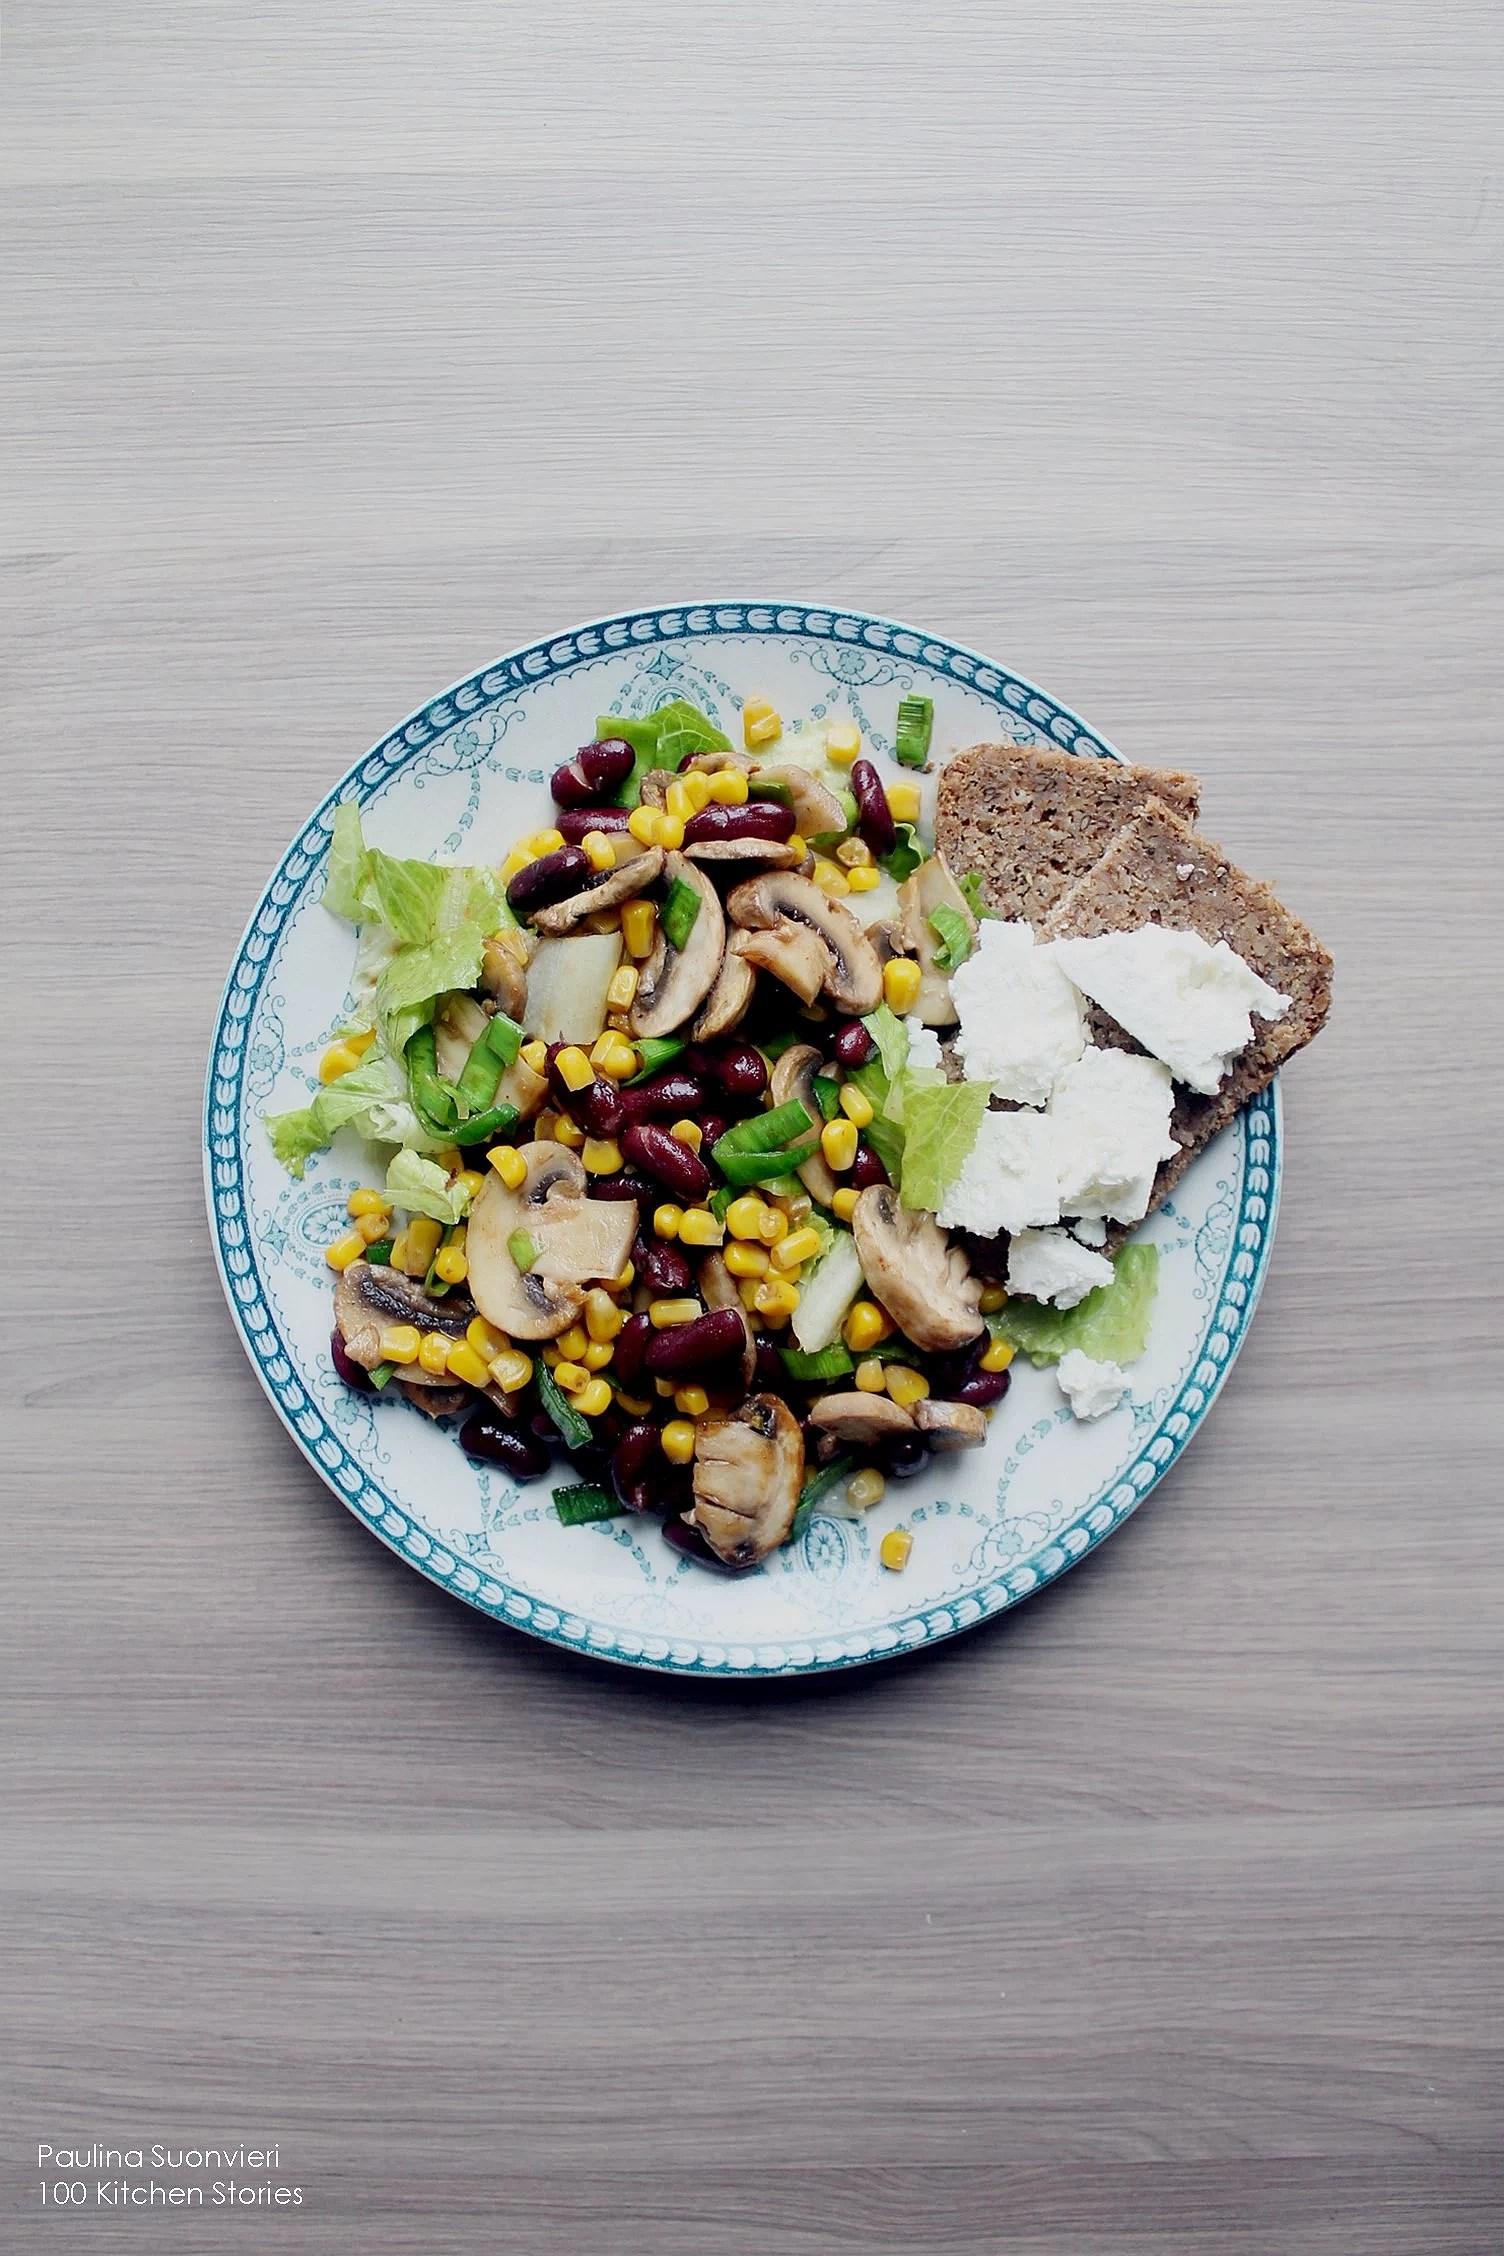 Valborg // Veg Bean & Mushroom Salad Plate w Wholemeal Bread